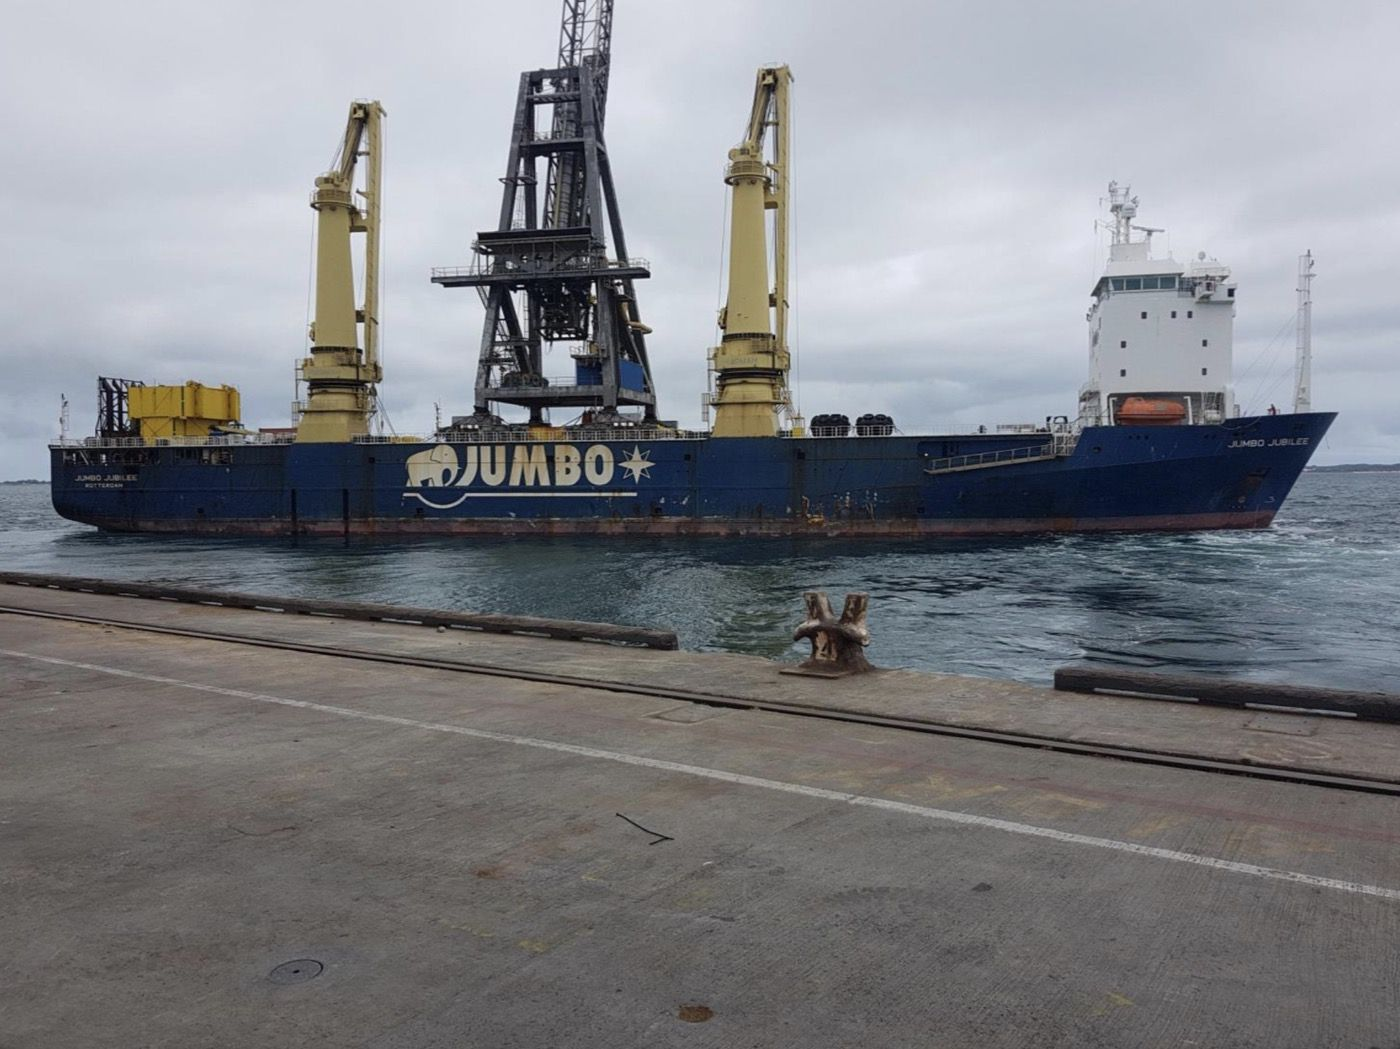 11-fremantle-port-crane-removal@2x